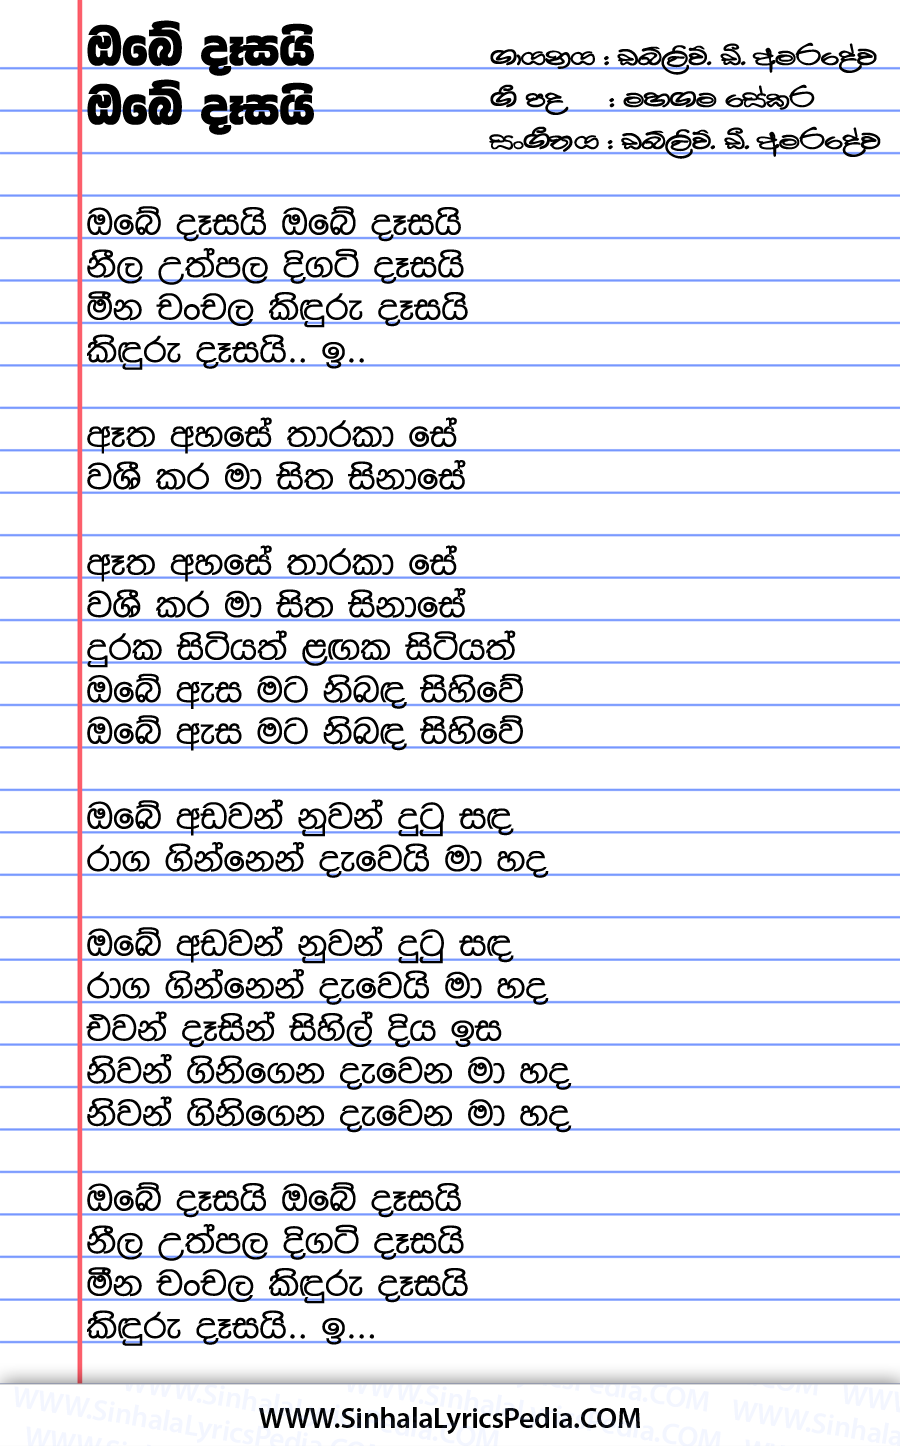 Obe Dasai Obe Dasai Song Lyrics